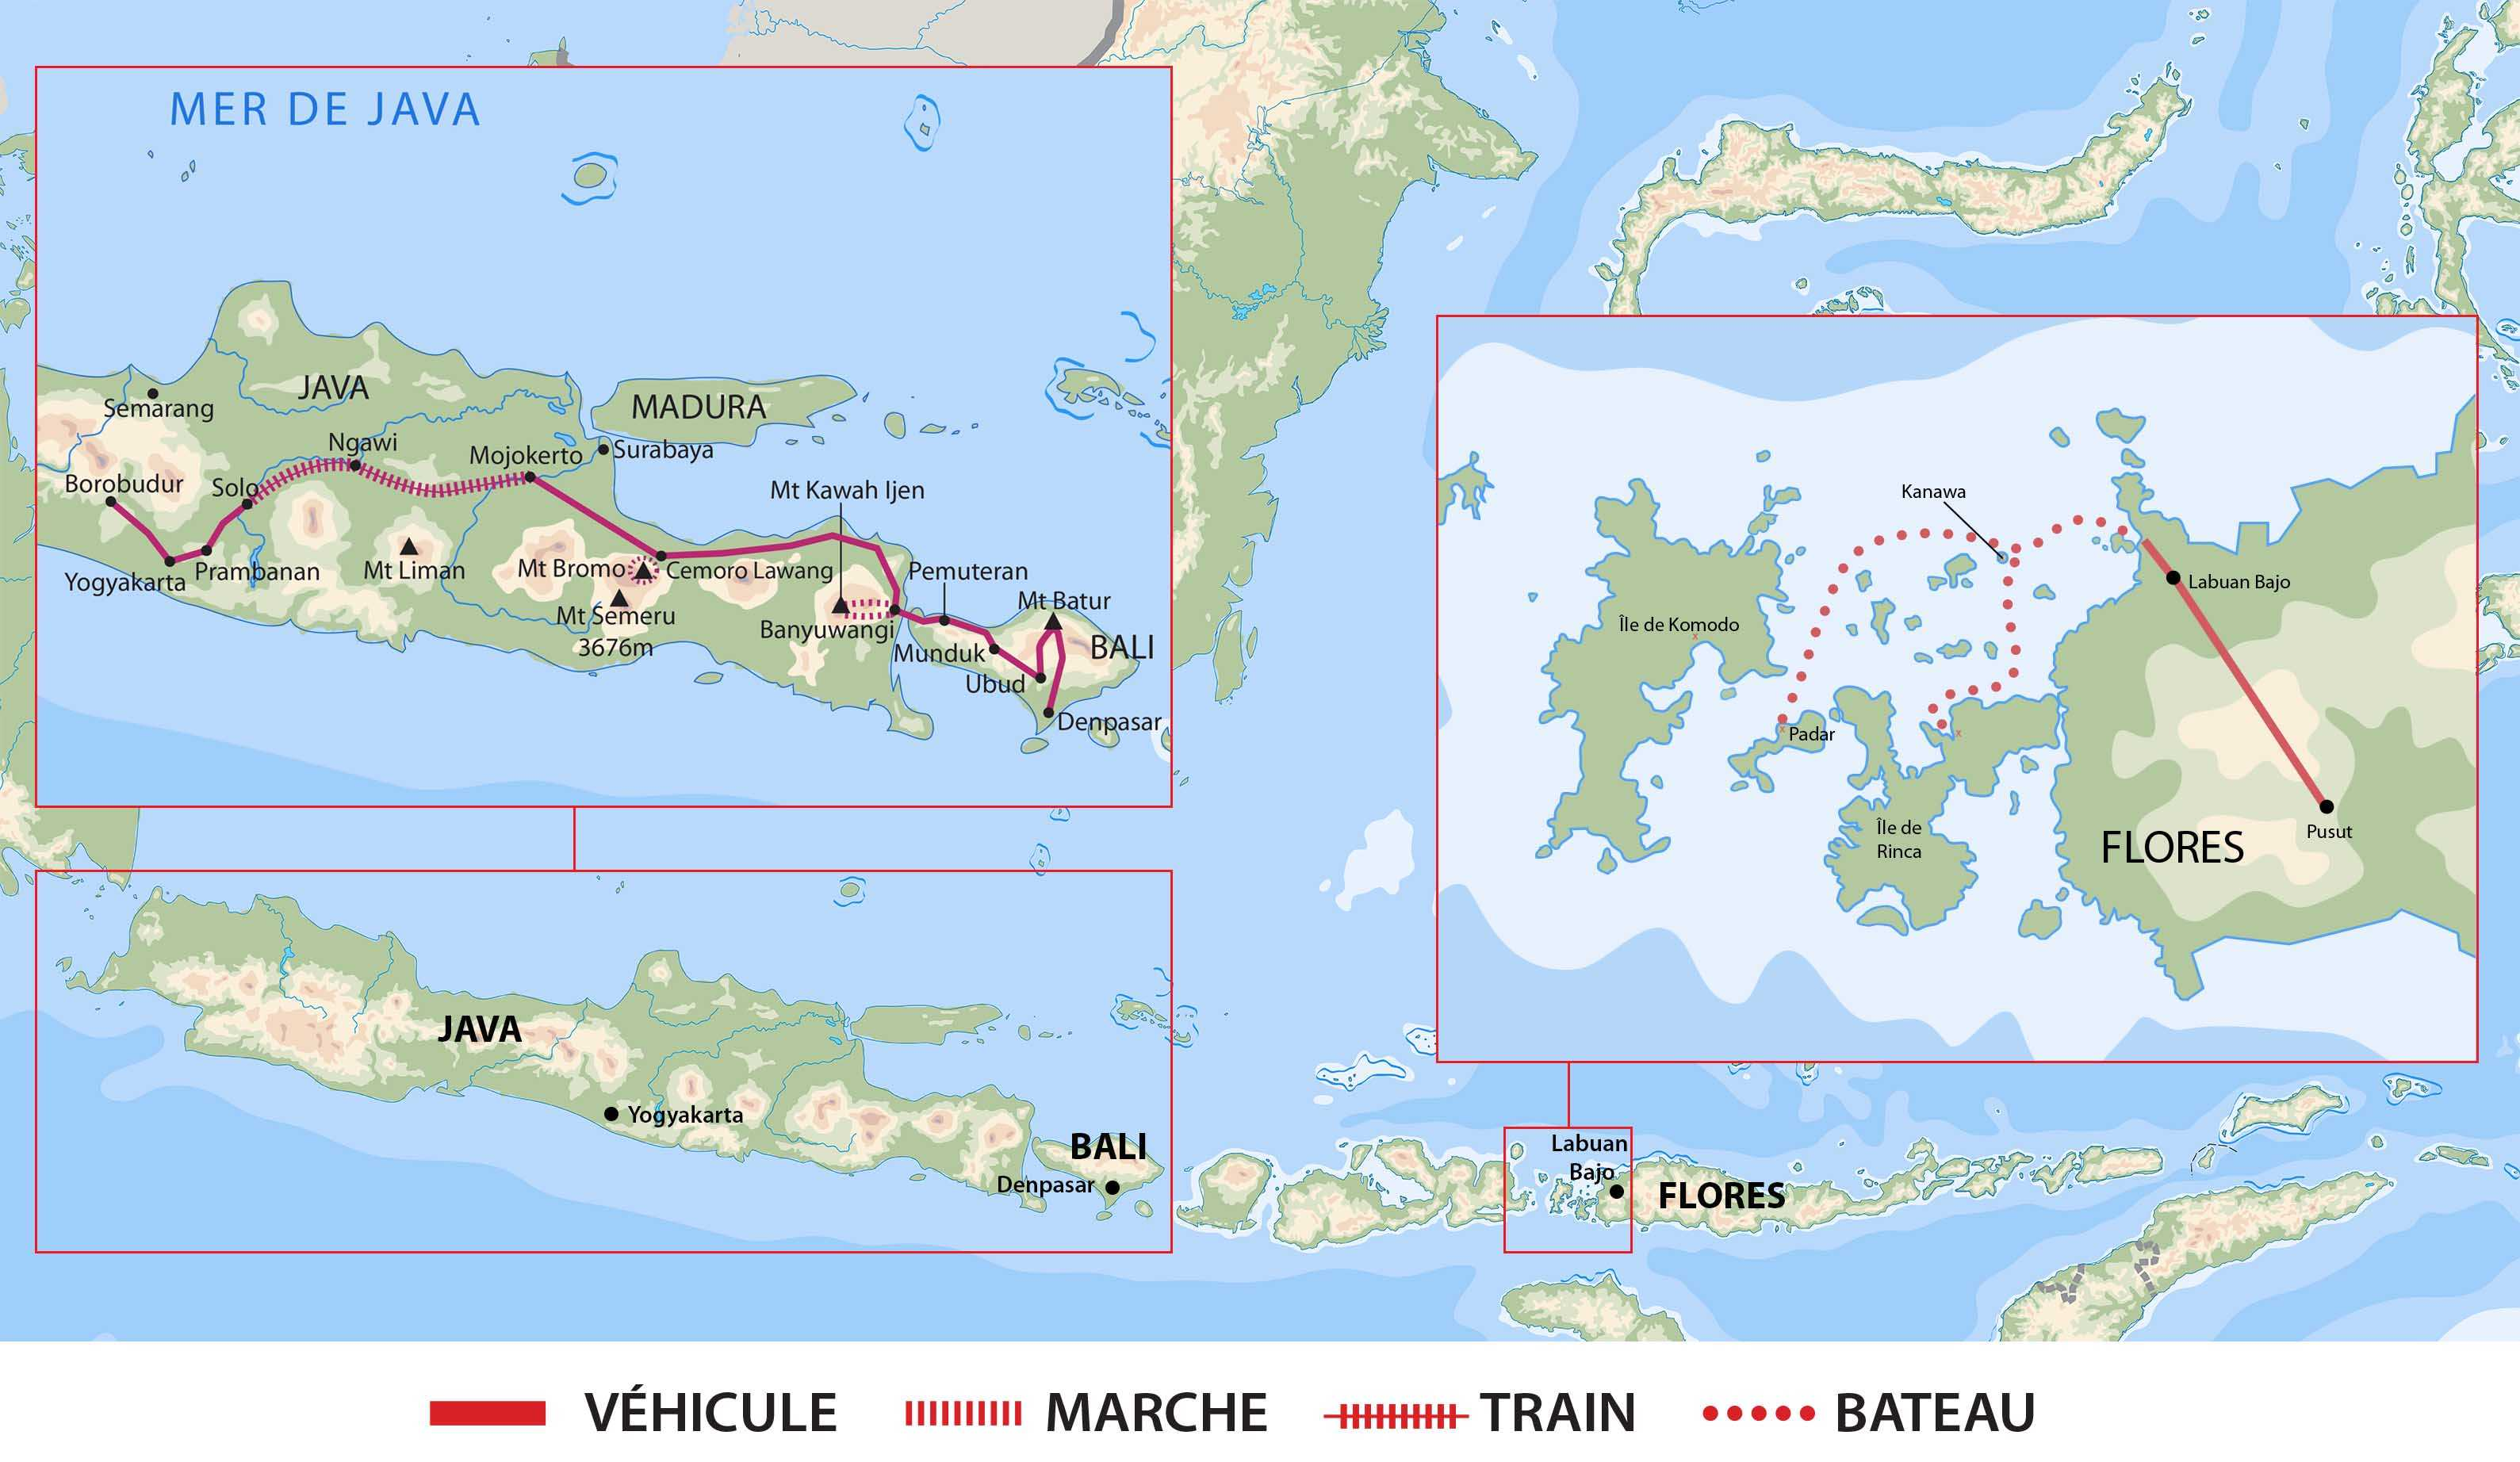 Carte circuit Java Bali  Flores- AIJABFLO